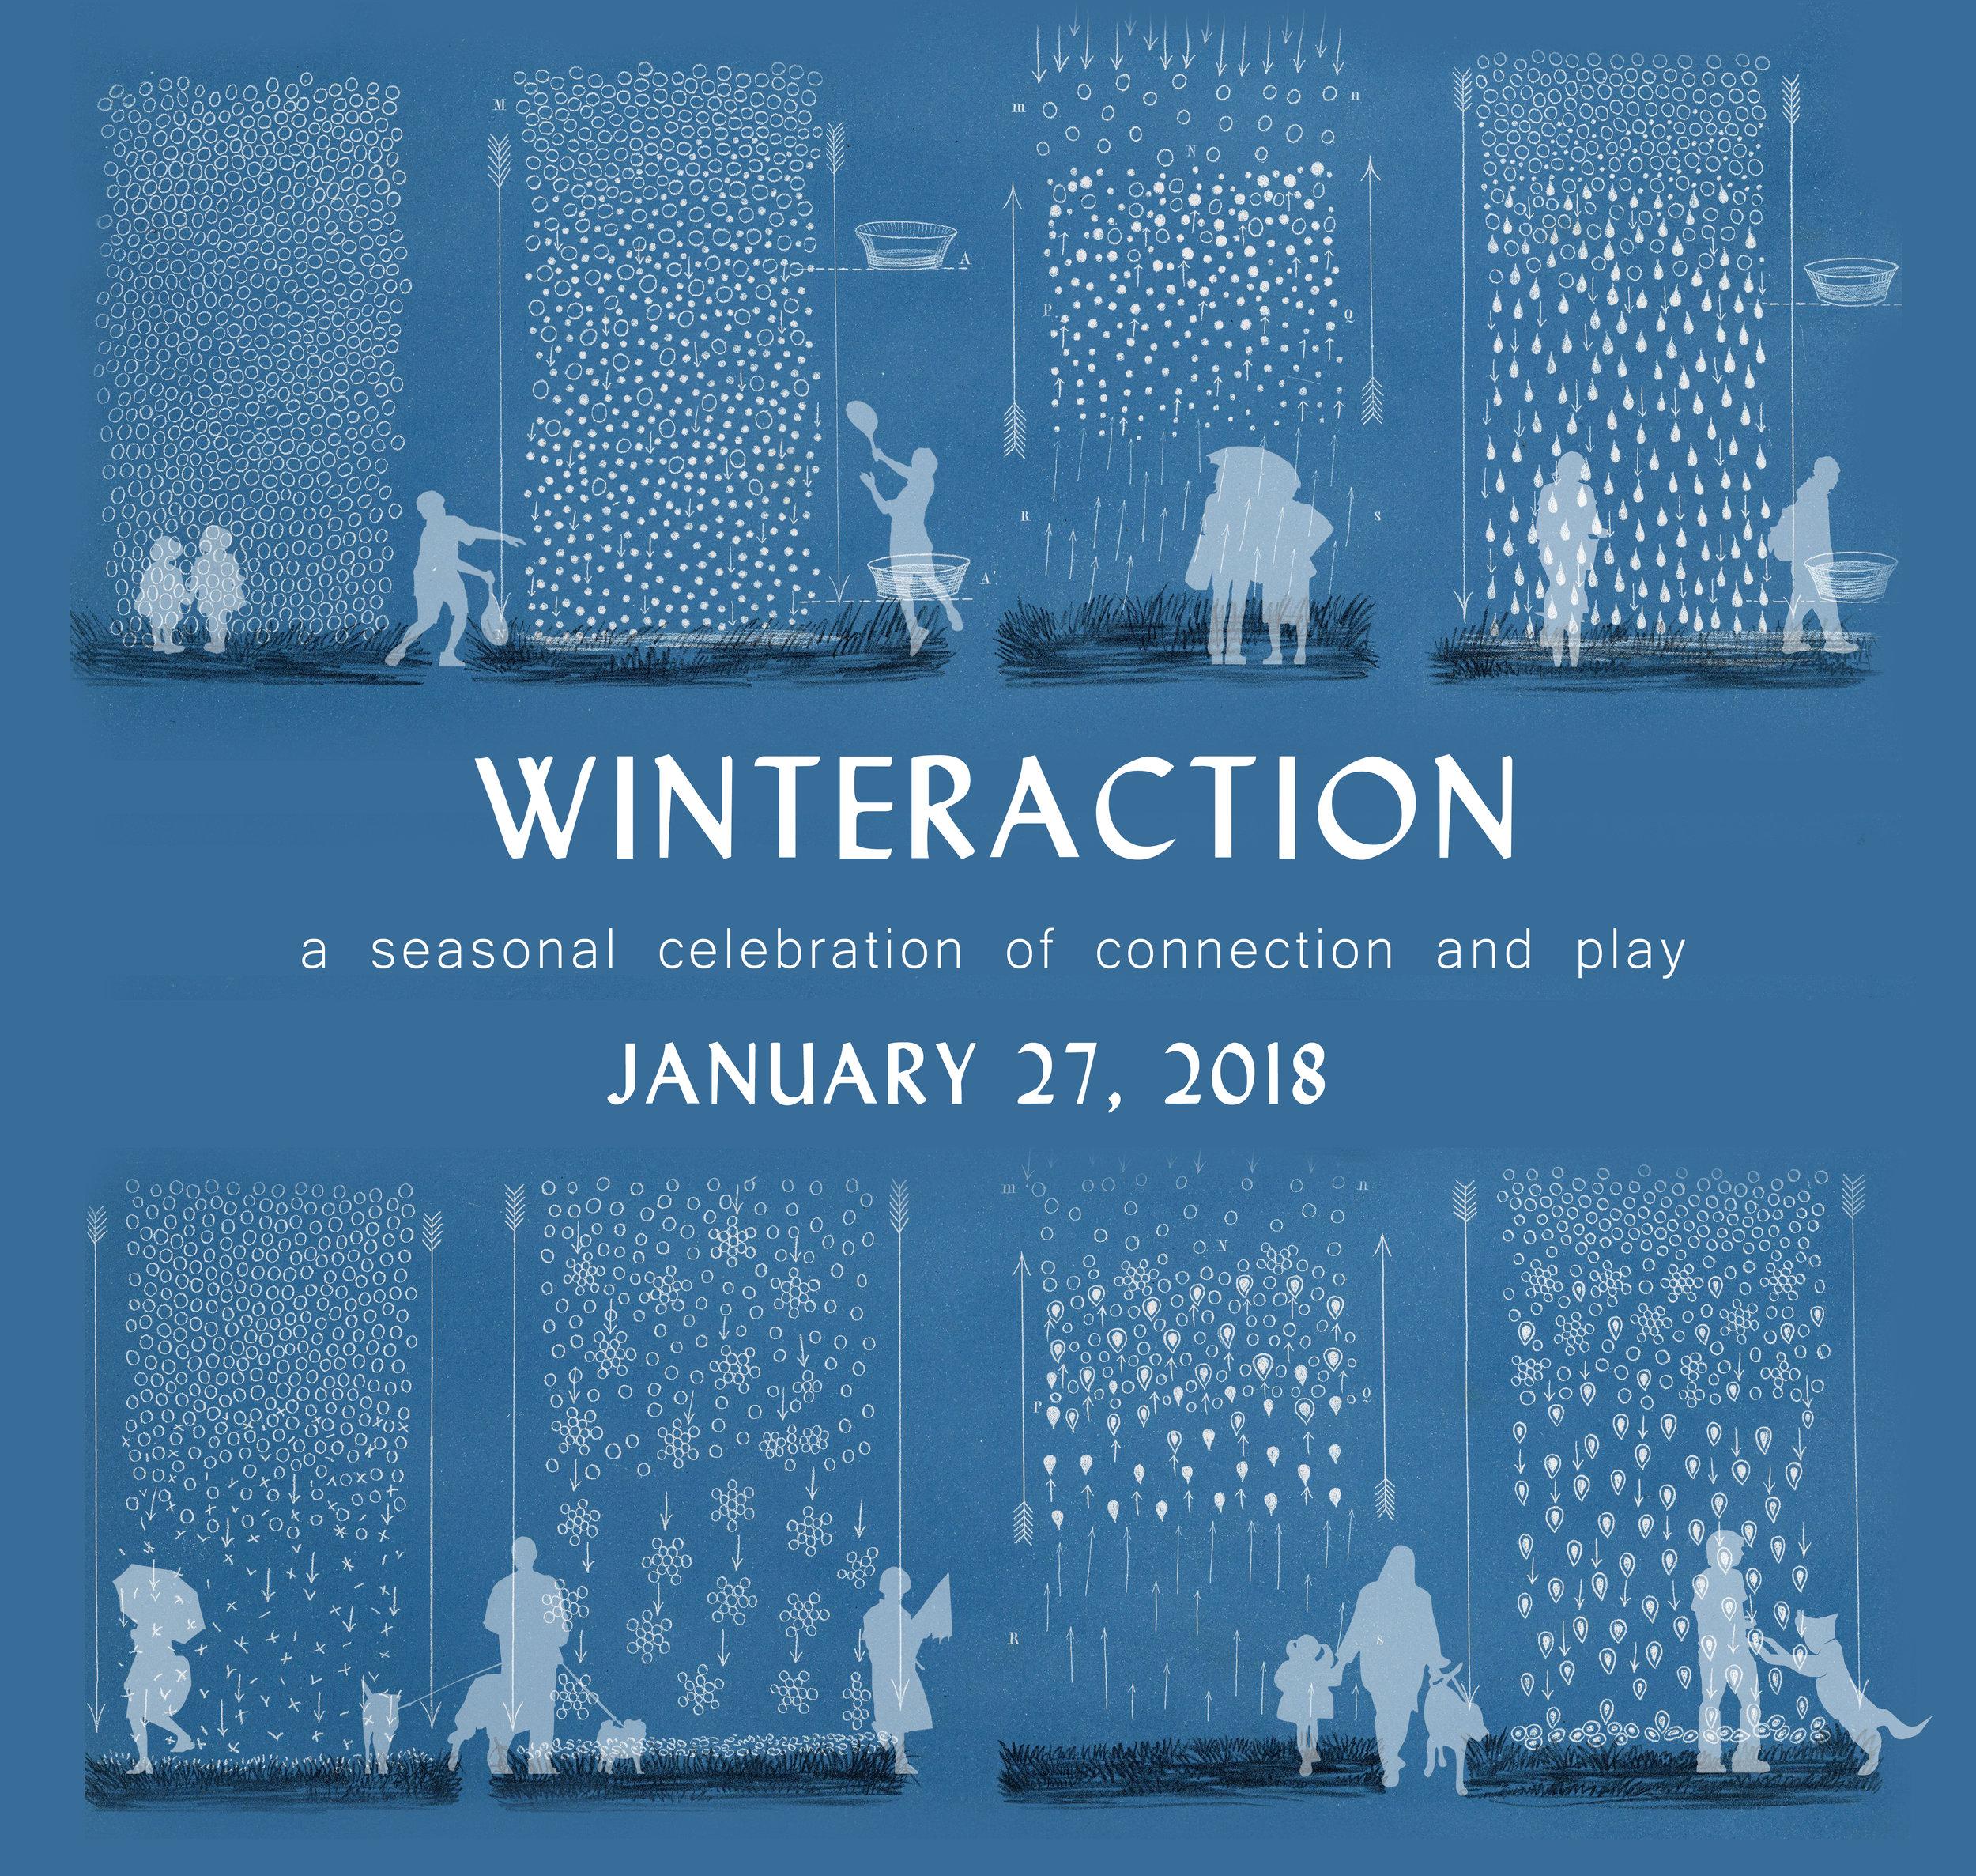 winteraction.jpg